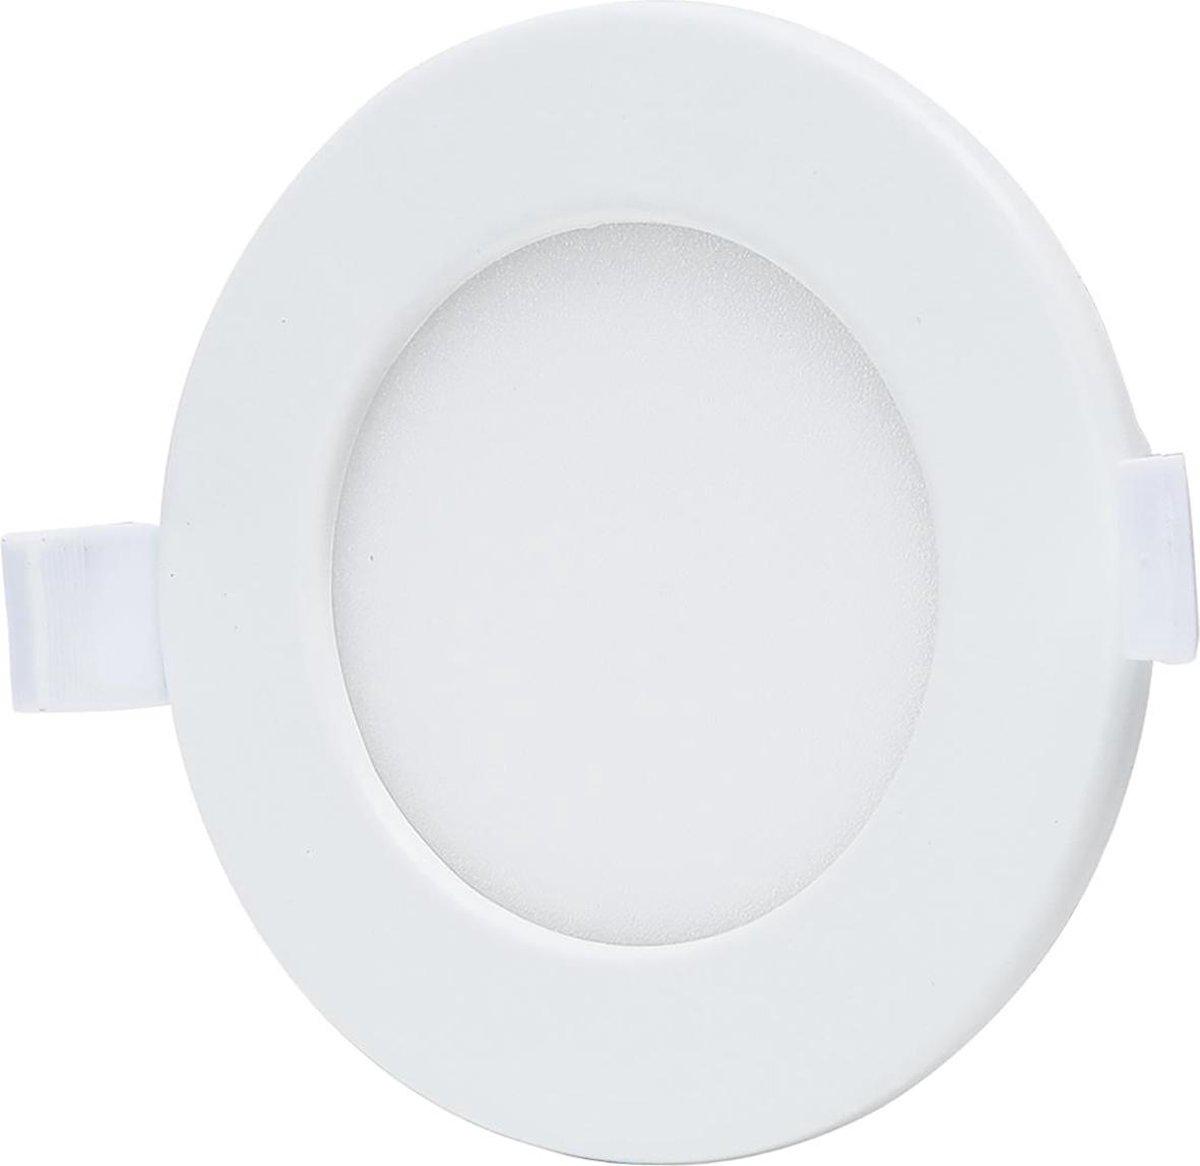 LED Downlight - Smart LED - Aigi Zumba - 6W - Aanpasbare Kleur - Inbouw Rond - Mat Wit - Aluminium - Ø105mm - BSE